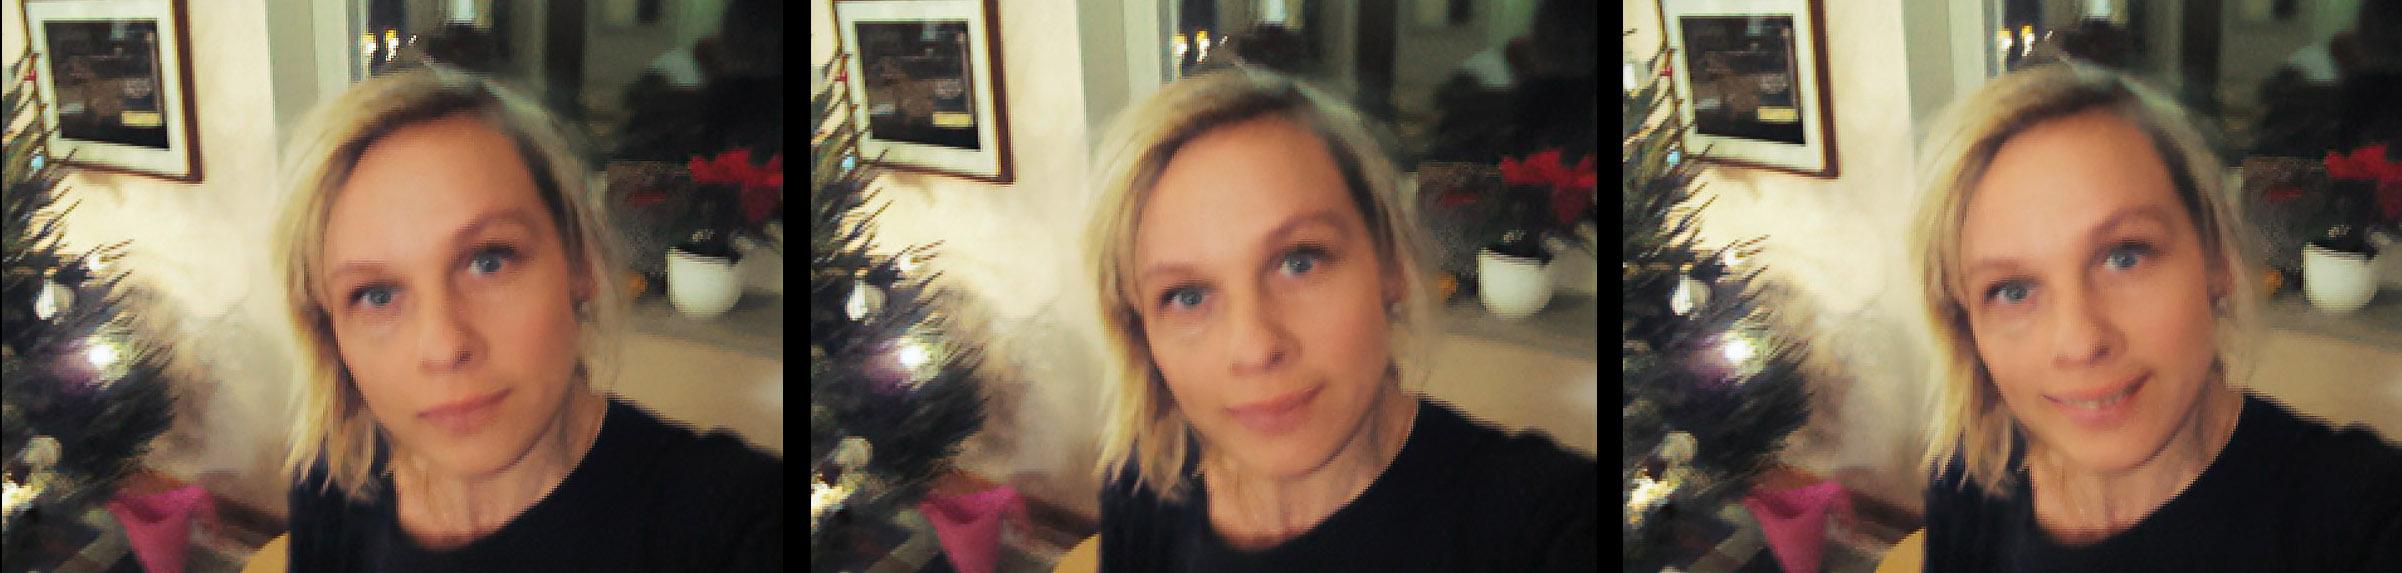 Praktisk teknik med Eva Teréz Gölin